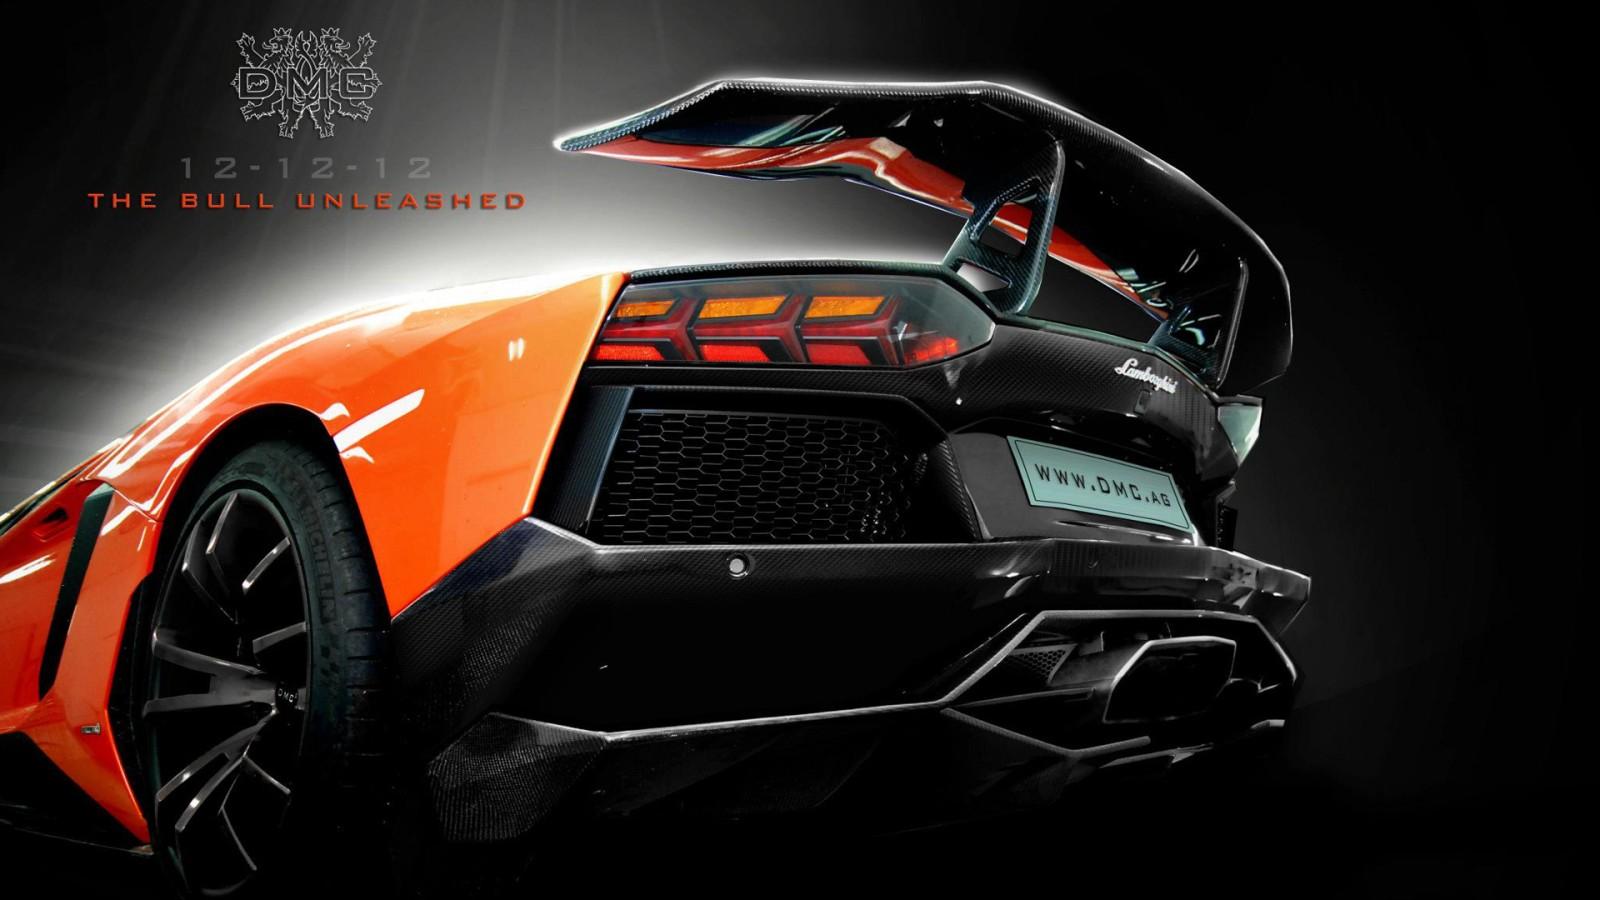 Cars Hd Wallpapers 1080p For Pc Bmw Dmc Tuning 2013 Lamborghini Aventador Lp900 Sv 4 Wallpaper